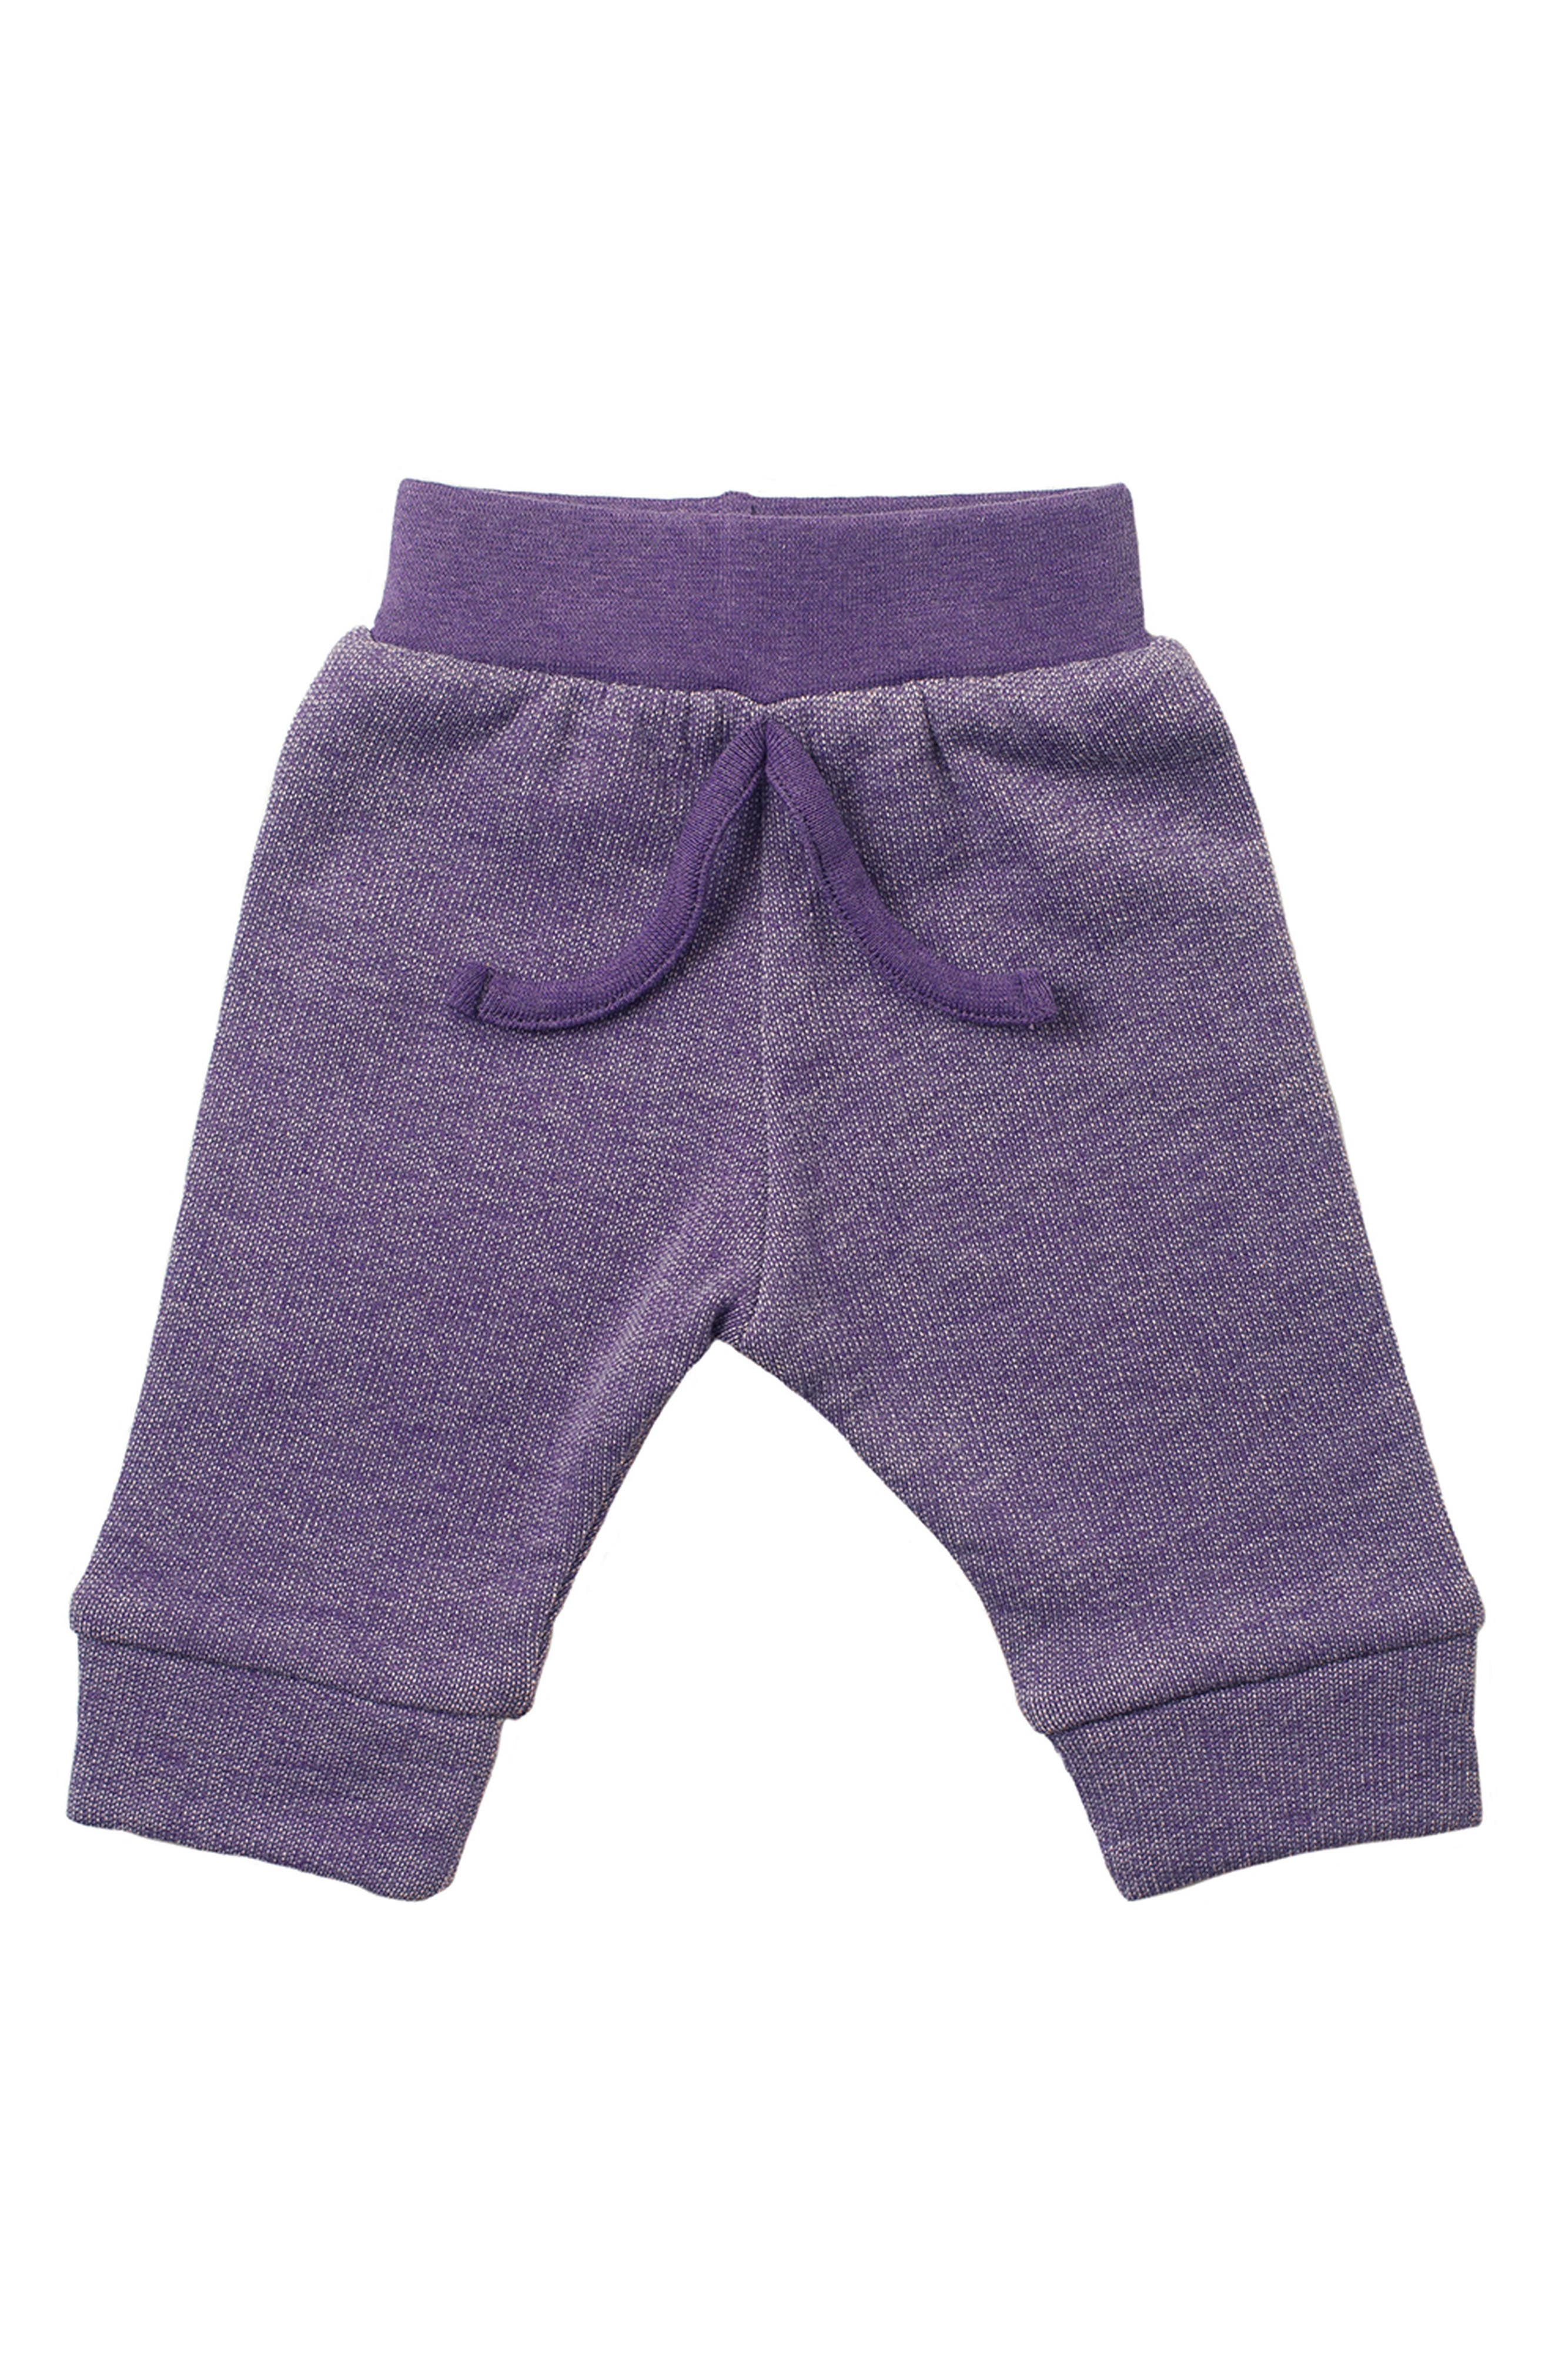 Organic Cotton Sweatpants,                         Main,                         color, Dark Purple Heather